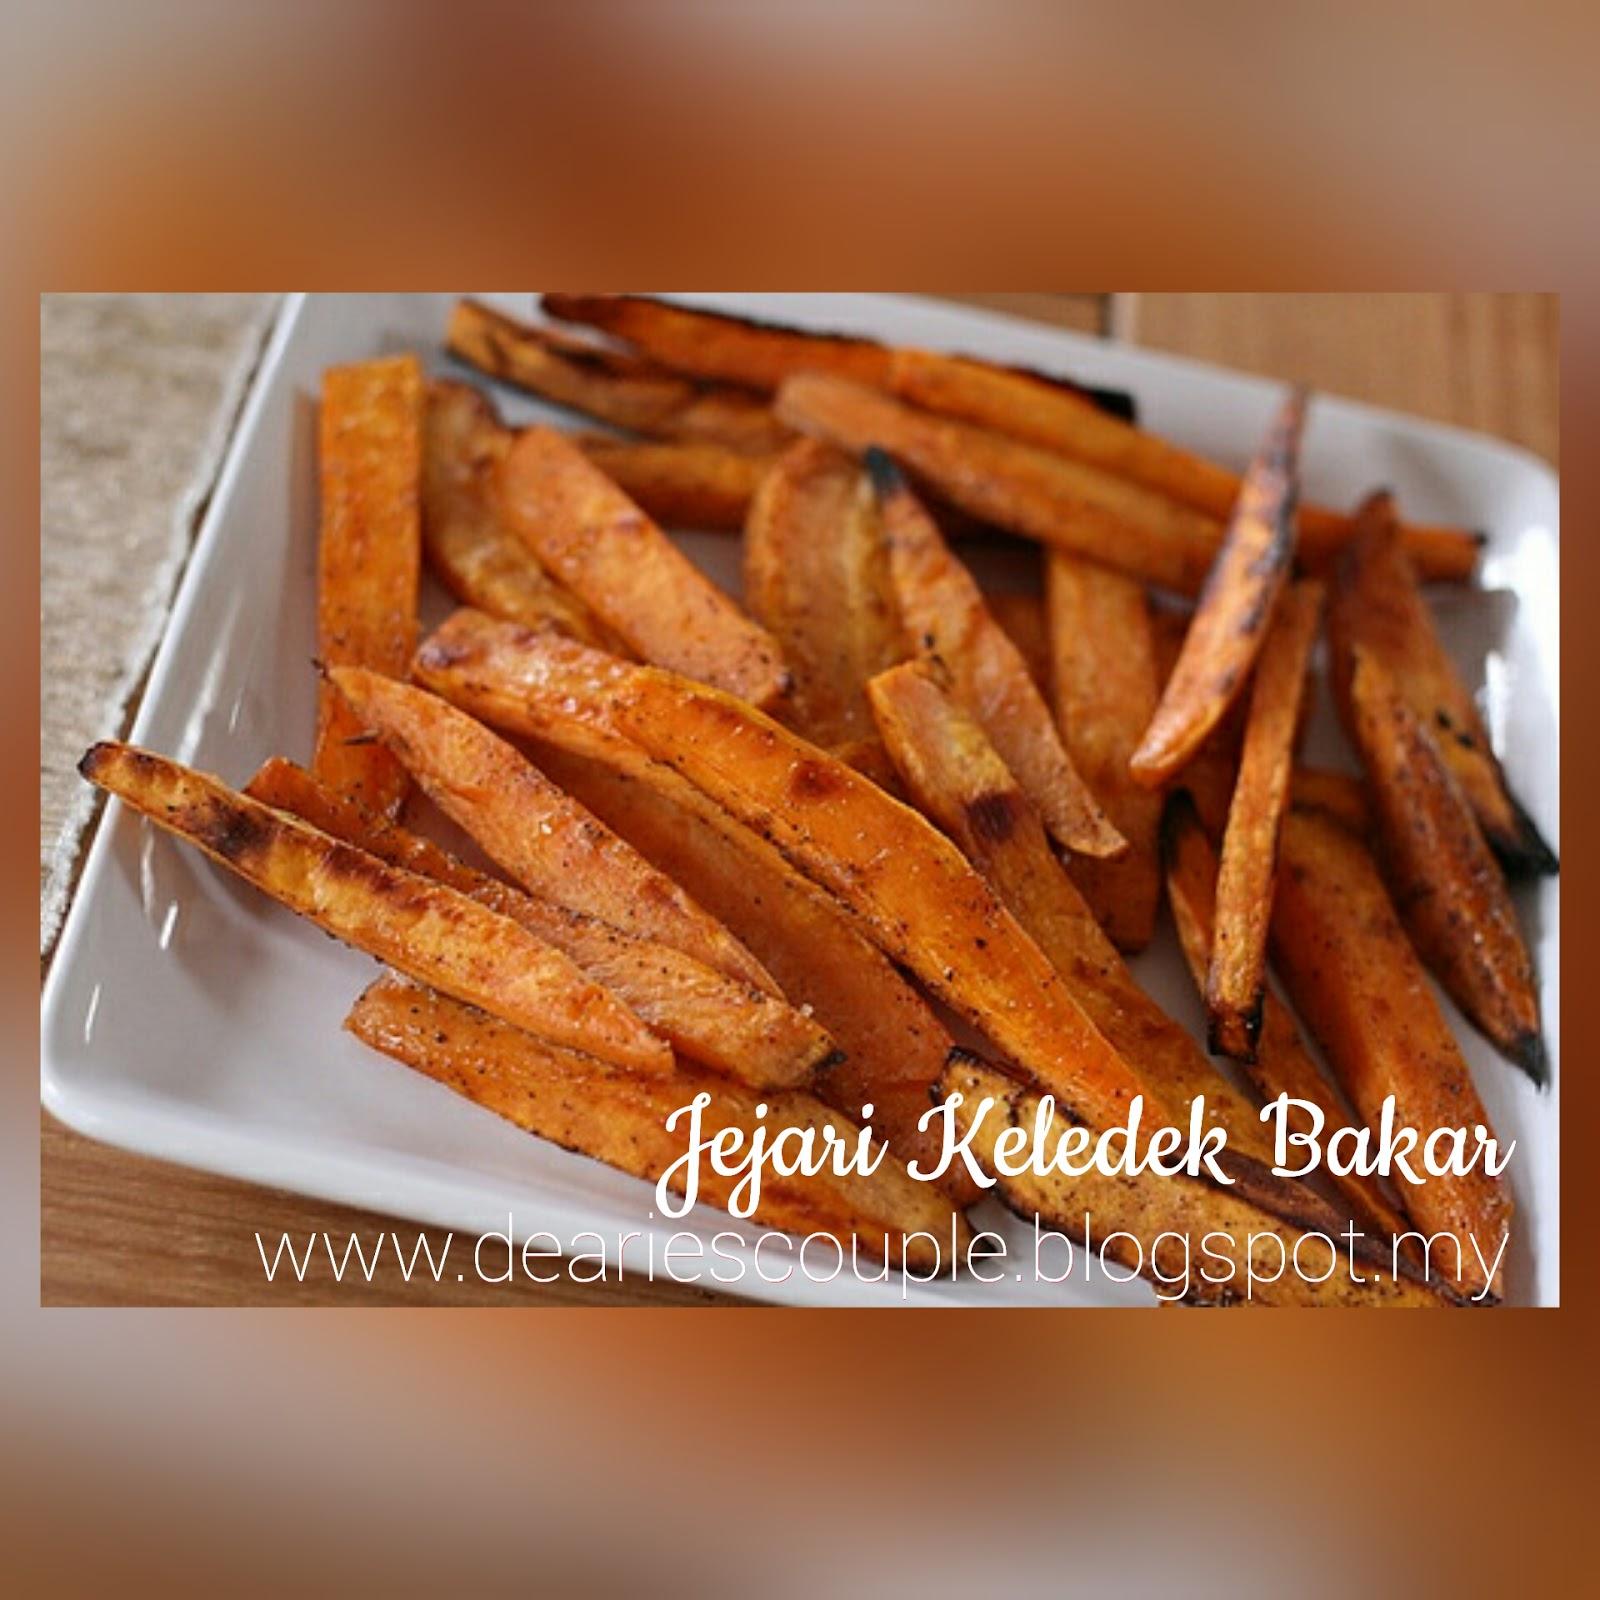 Resepi Jejari Ubi Keledek Bakar Baked Sweet Potato Fries